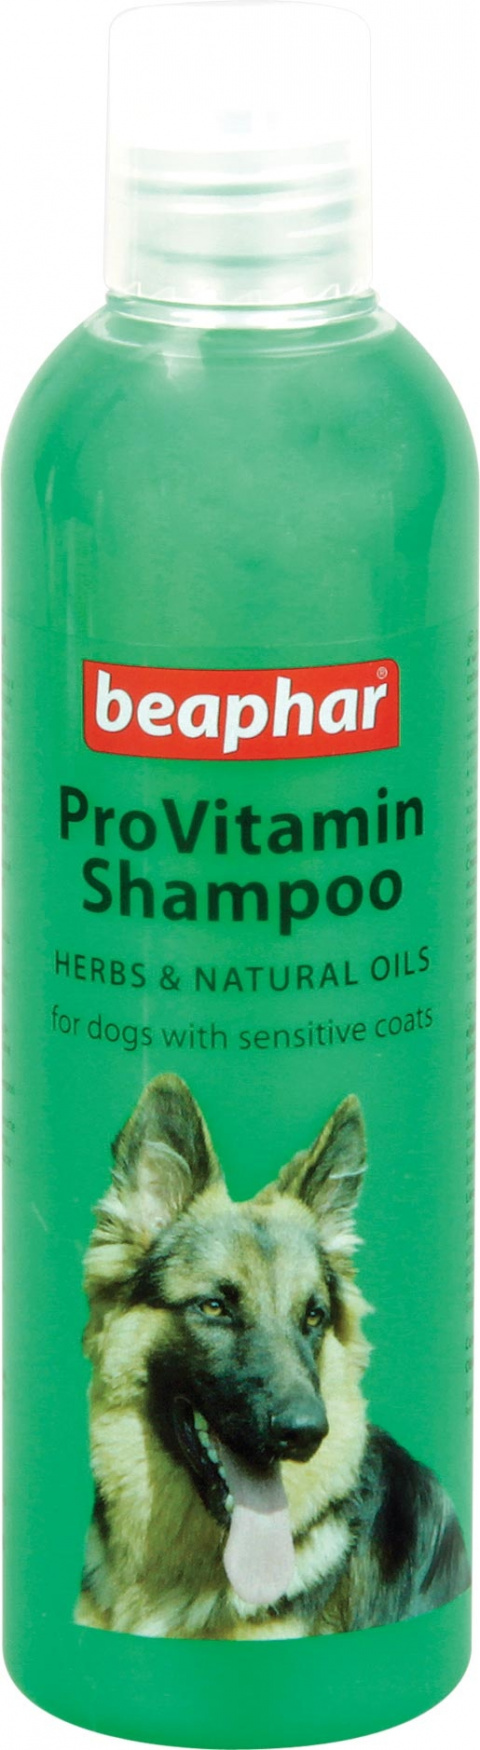 Шампунь для собак - Beaphar ProVitamin Shampoo Herbal, 250 мл title=